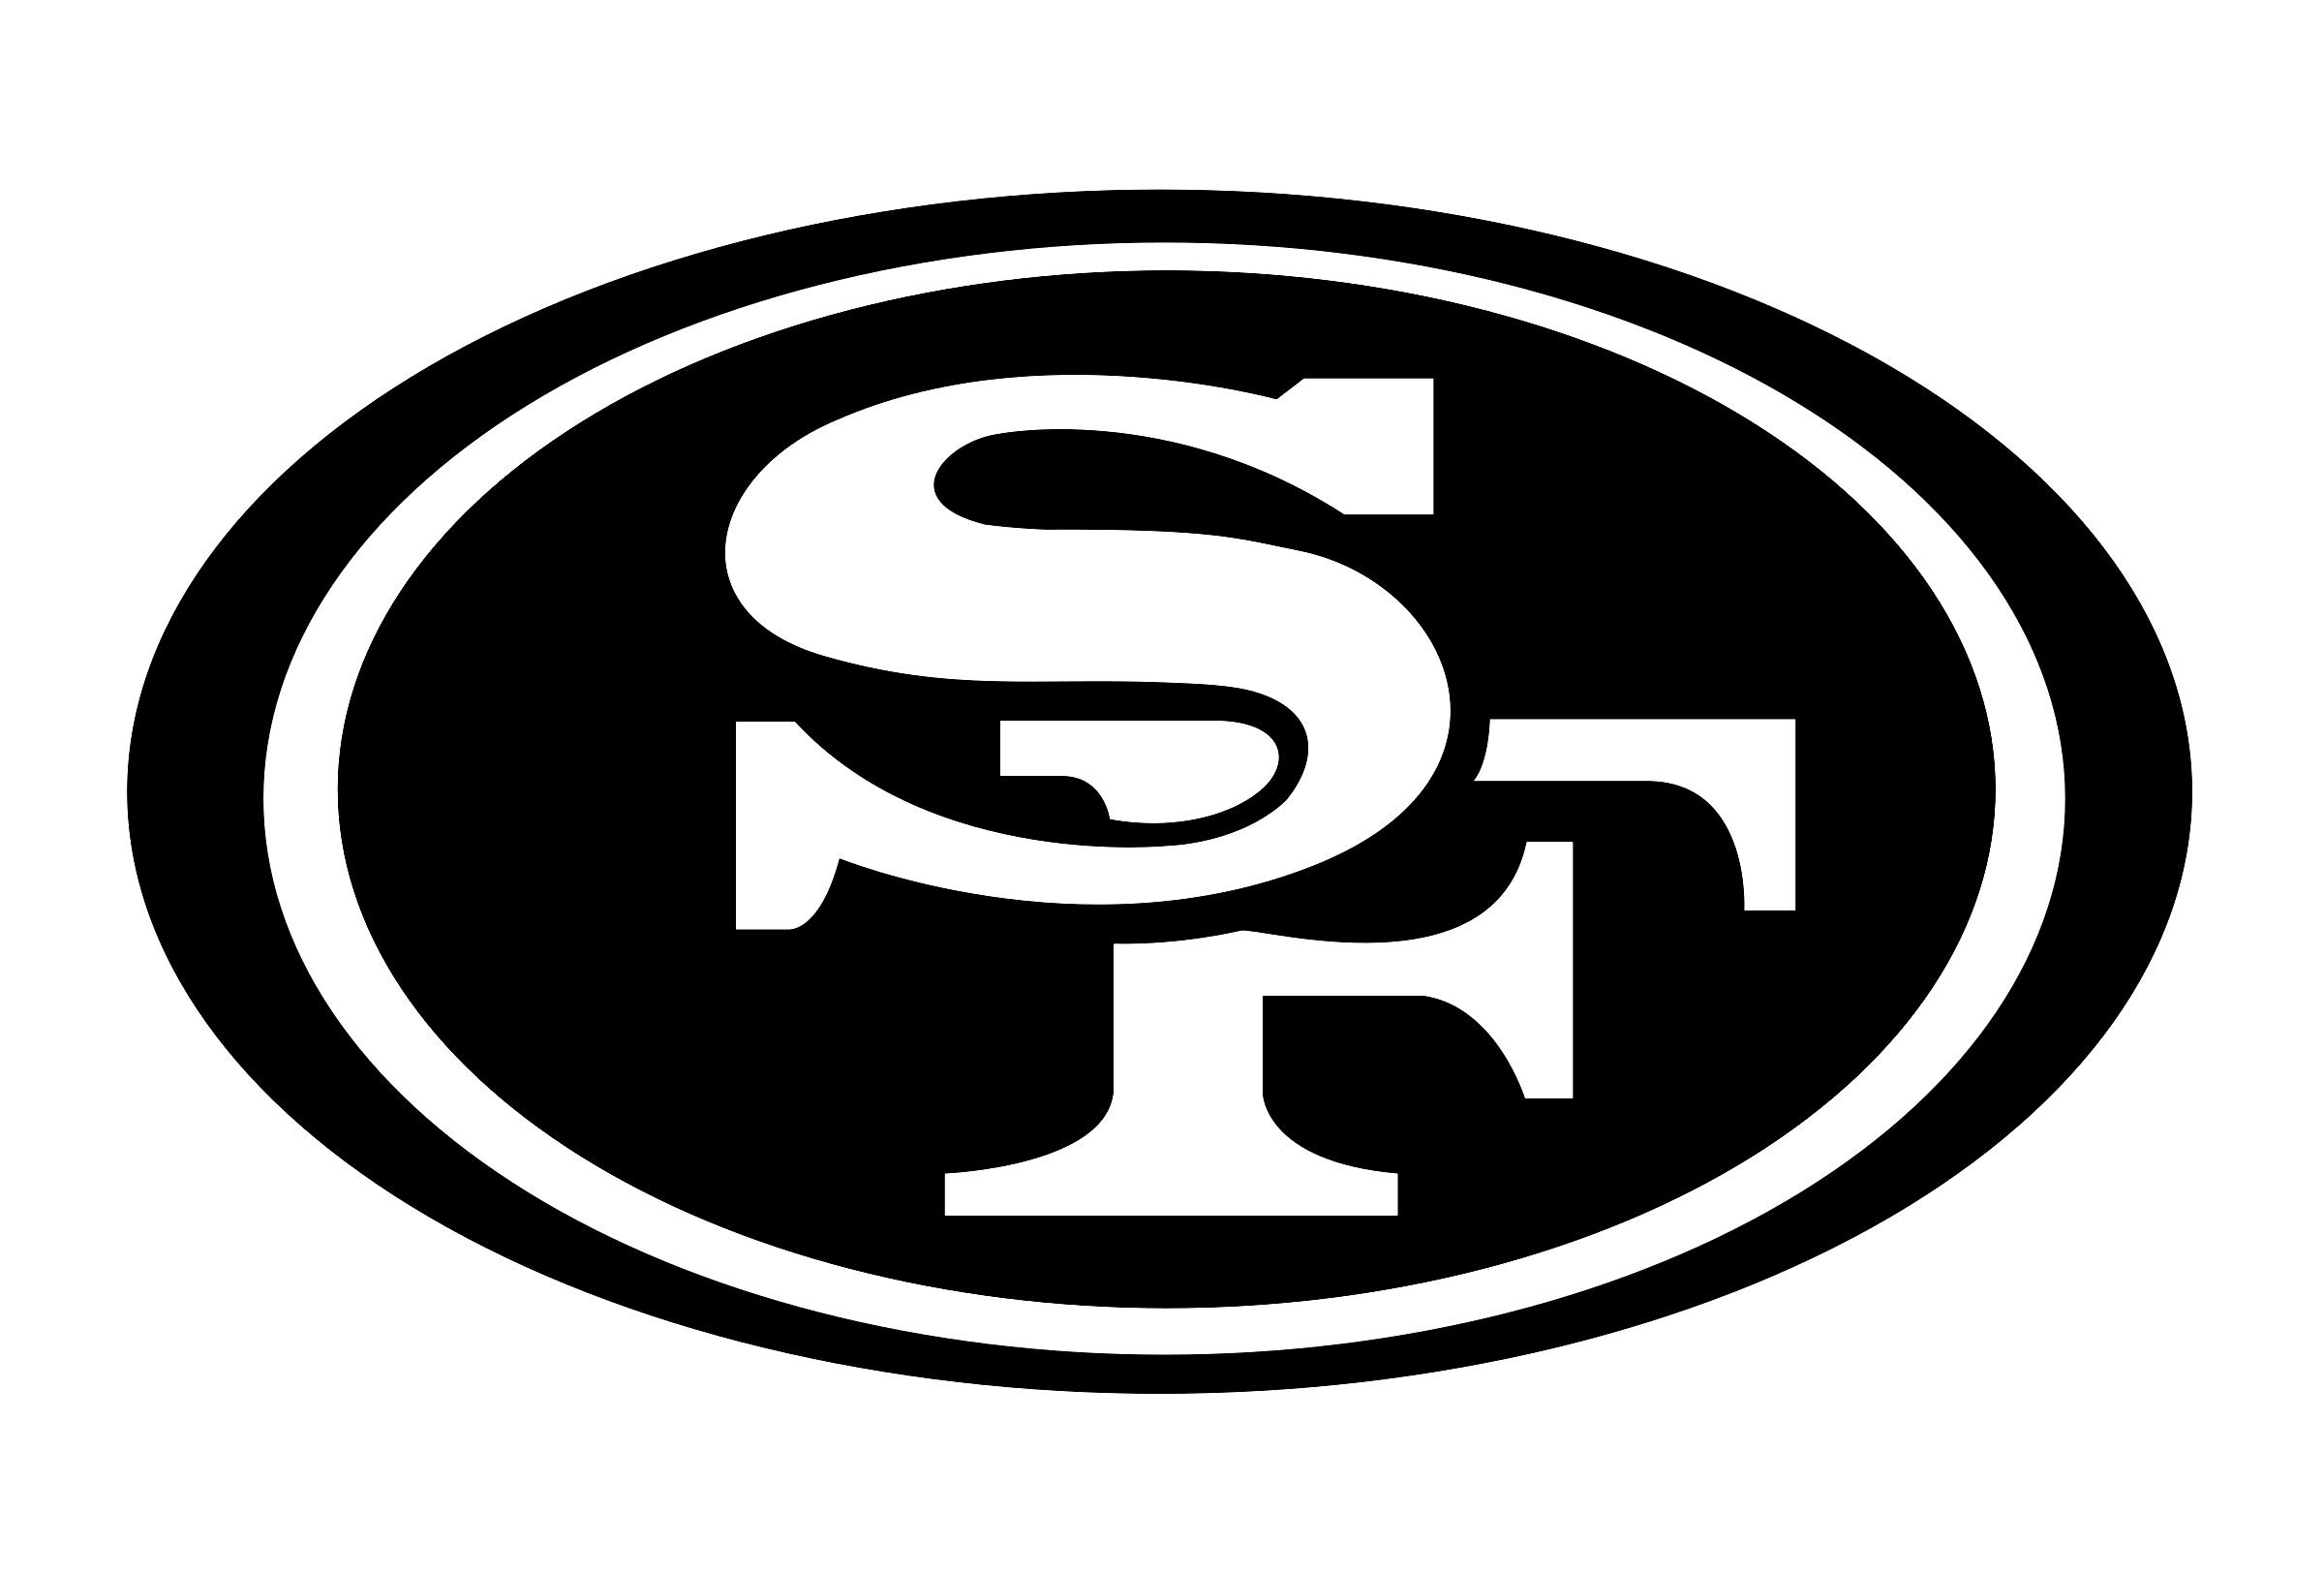 San Francisco 49ers Logo PNG Transparent & SVG Vector.